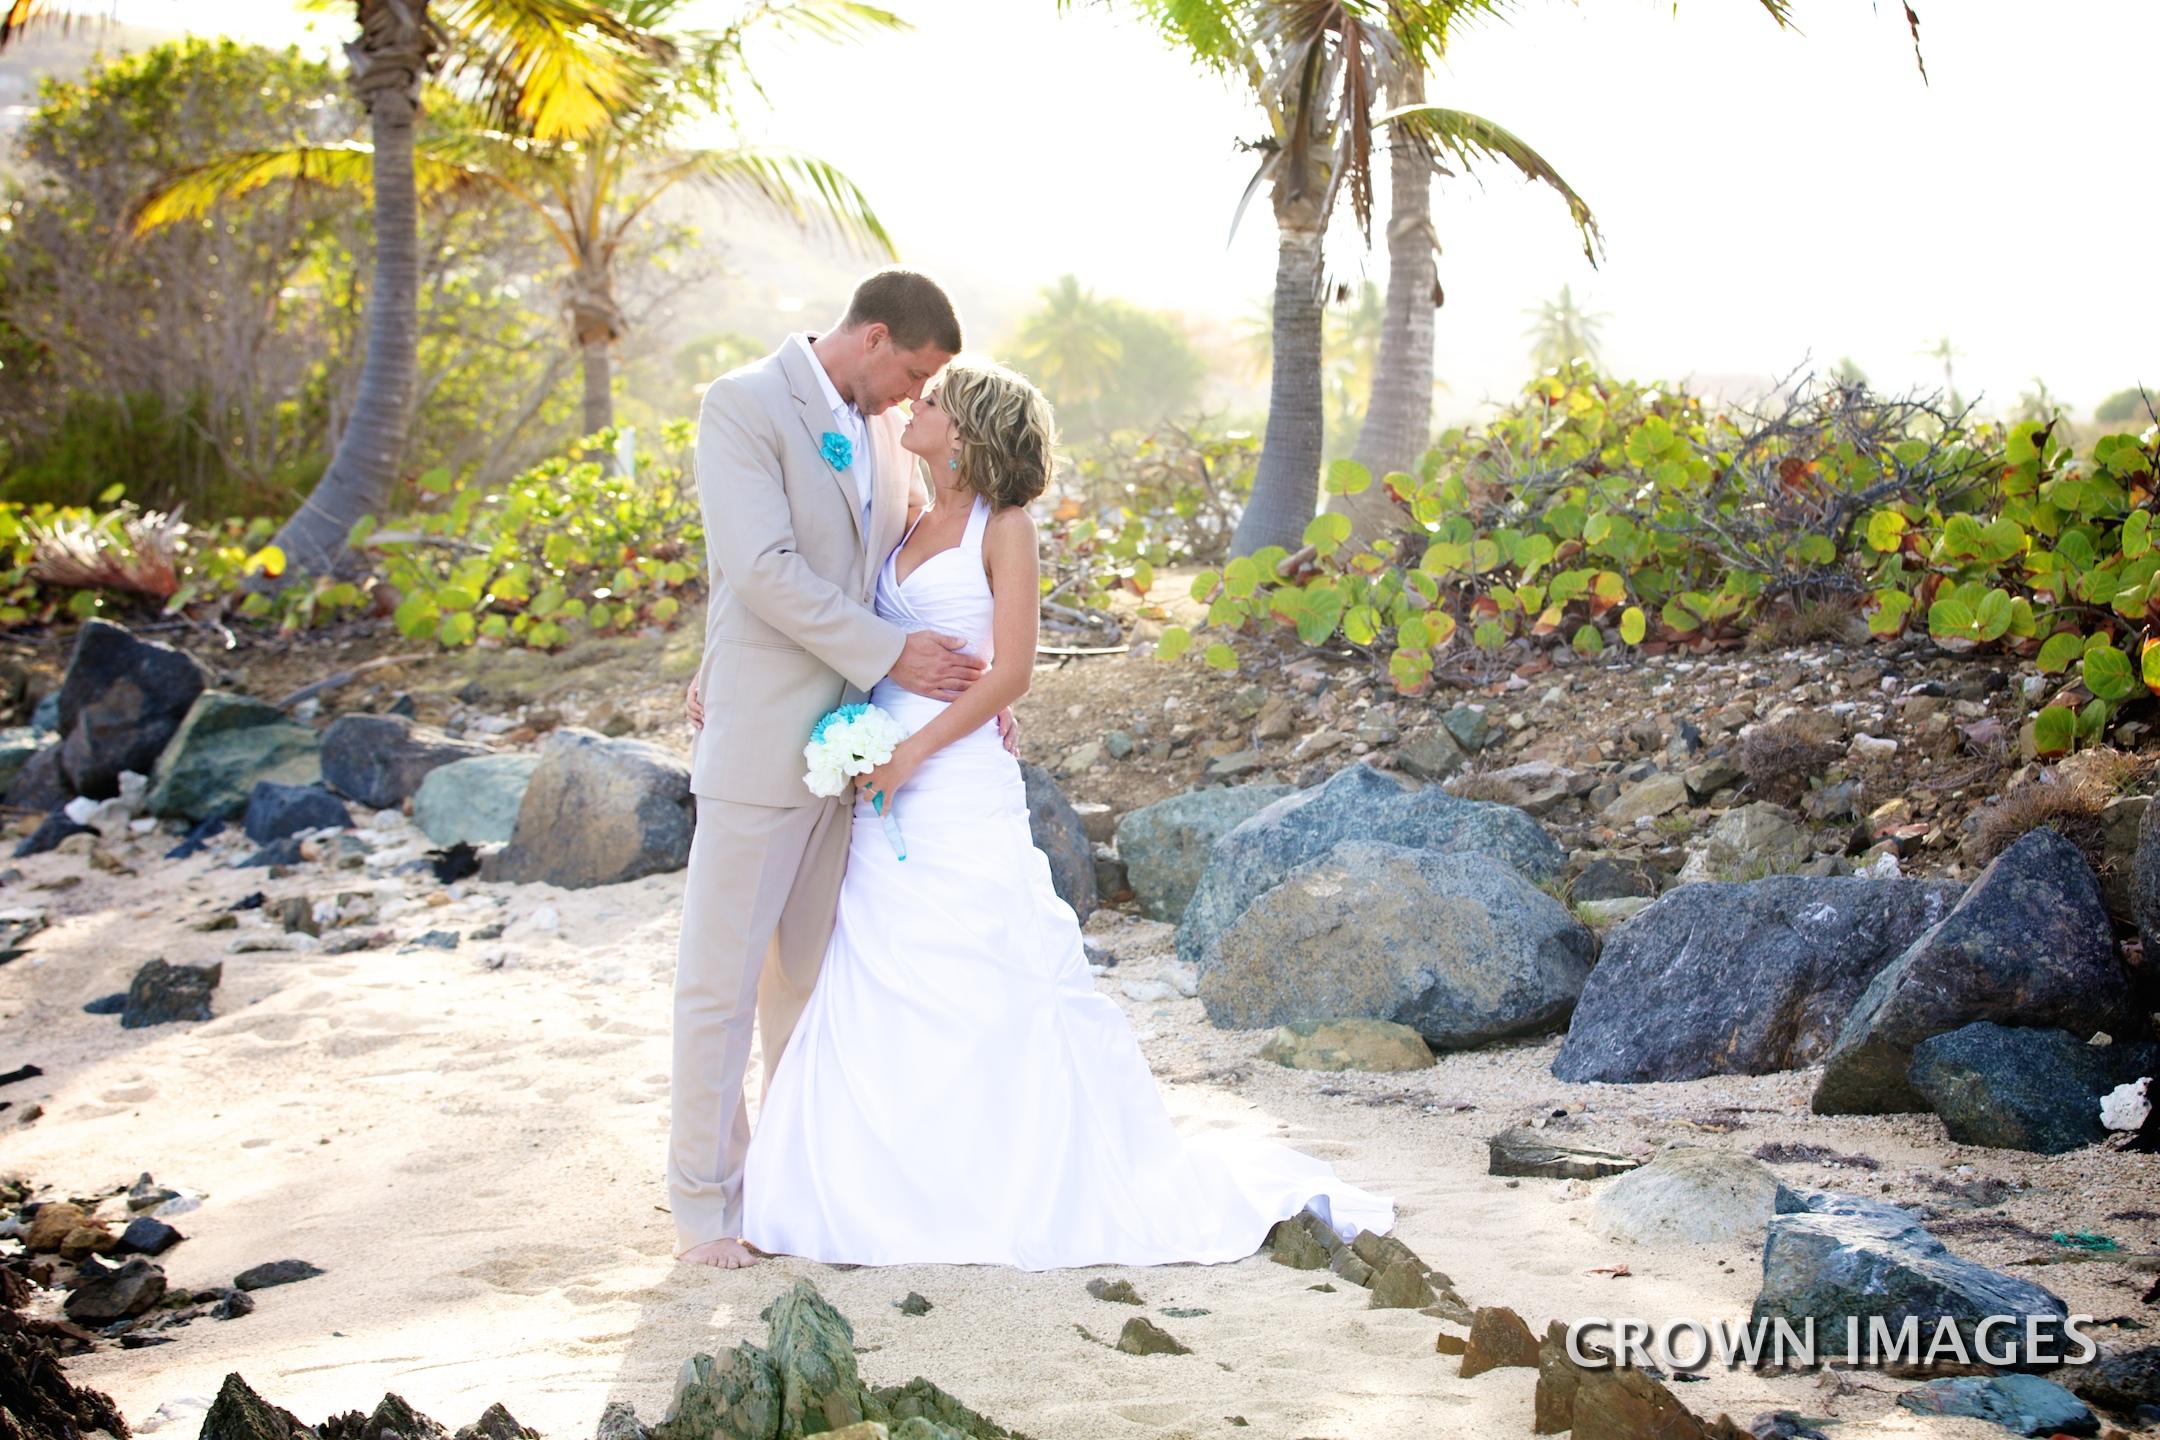 spretty klip point location for wedding on st thomas